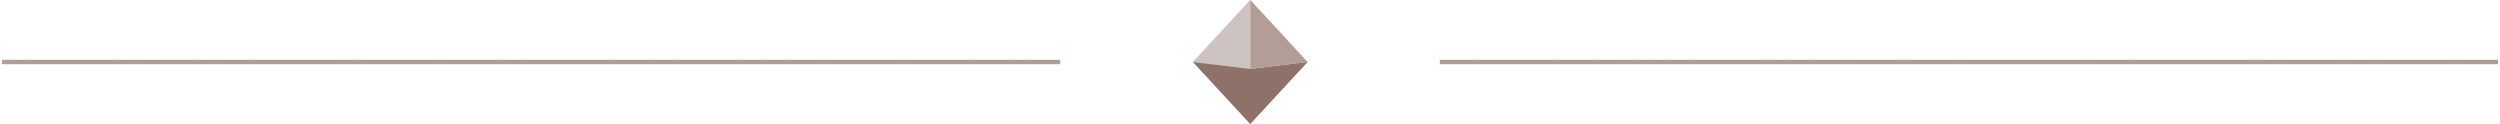 Platten-Seperator-full